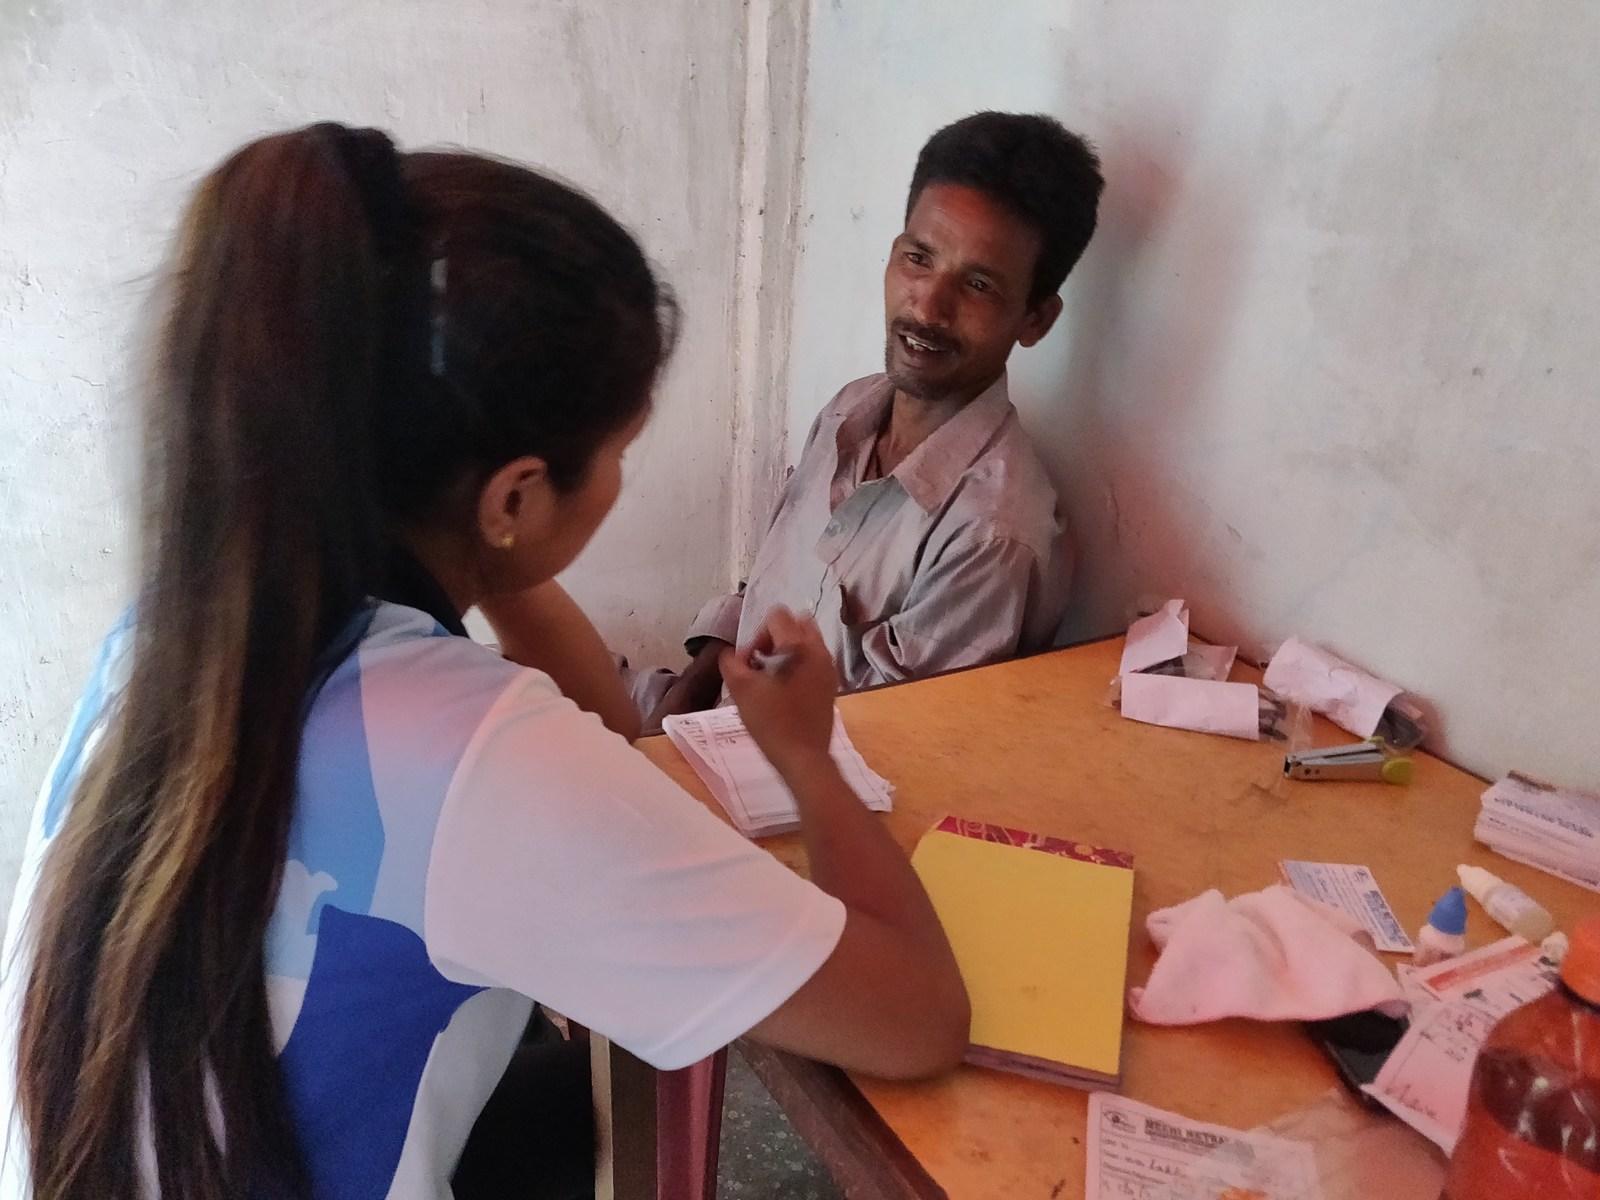 Free-Health-Camp-Eye-Screening-at-Gwala-Basti-Mechinagar-15-Jhapa-Nepal-Rotary-Club-of-Kakarvitta-36